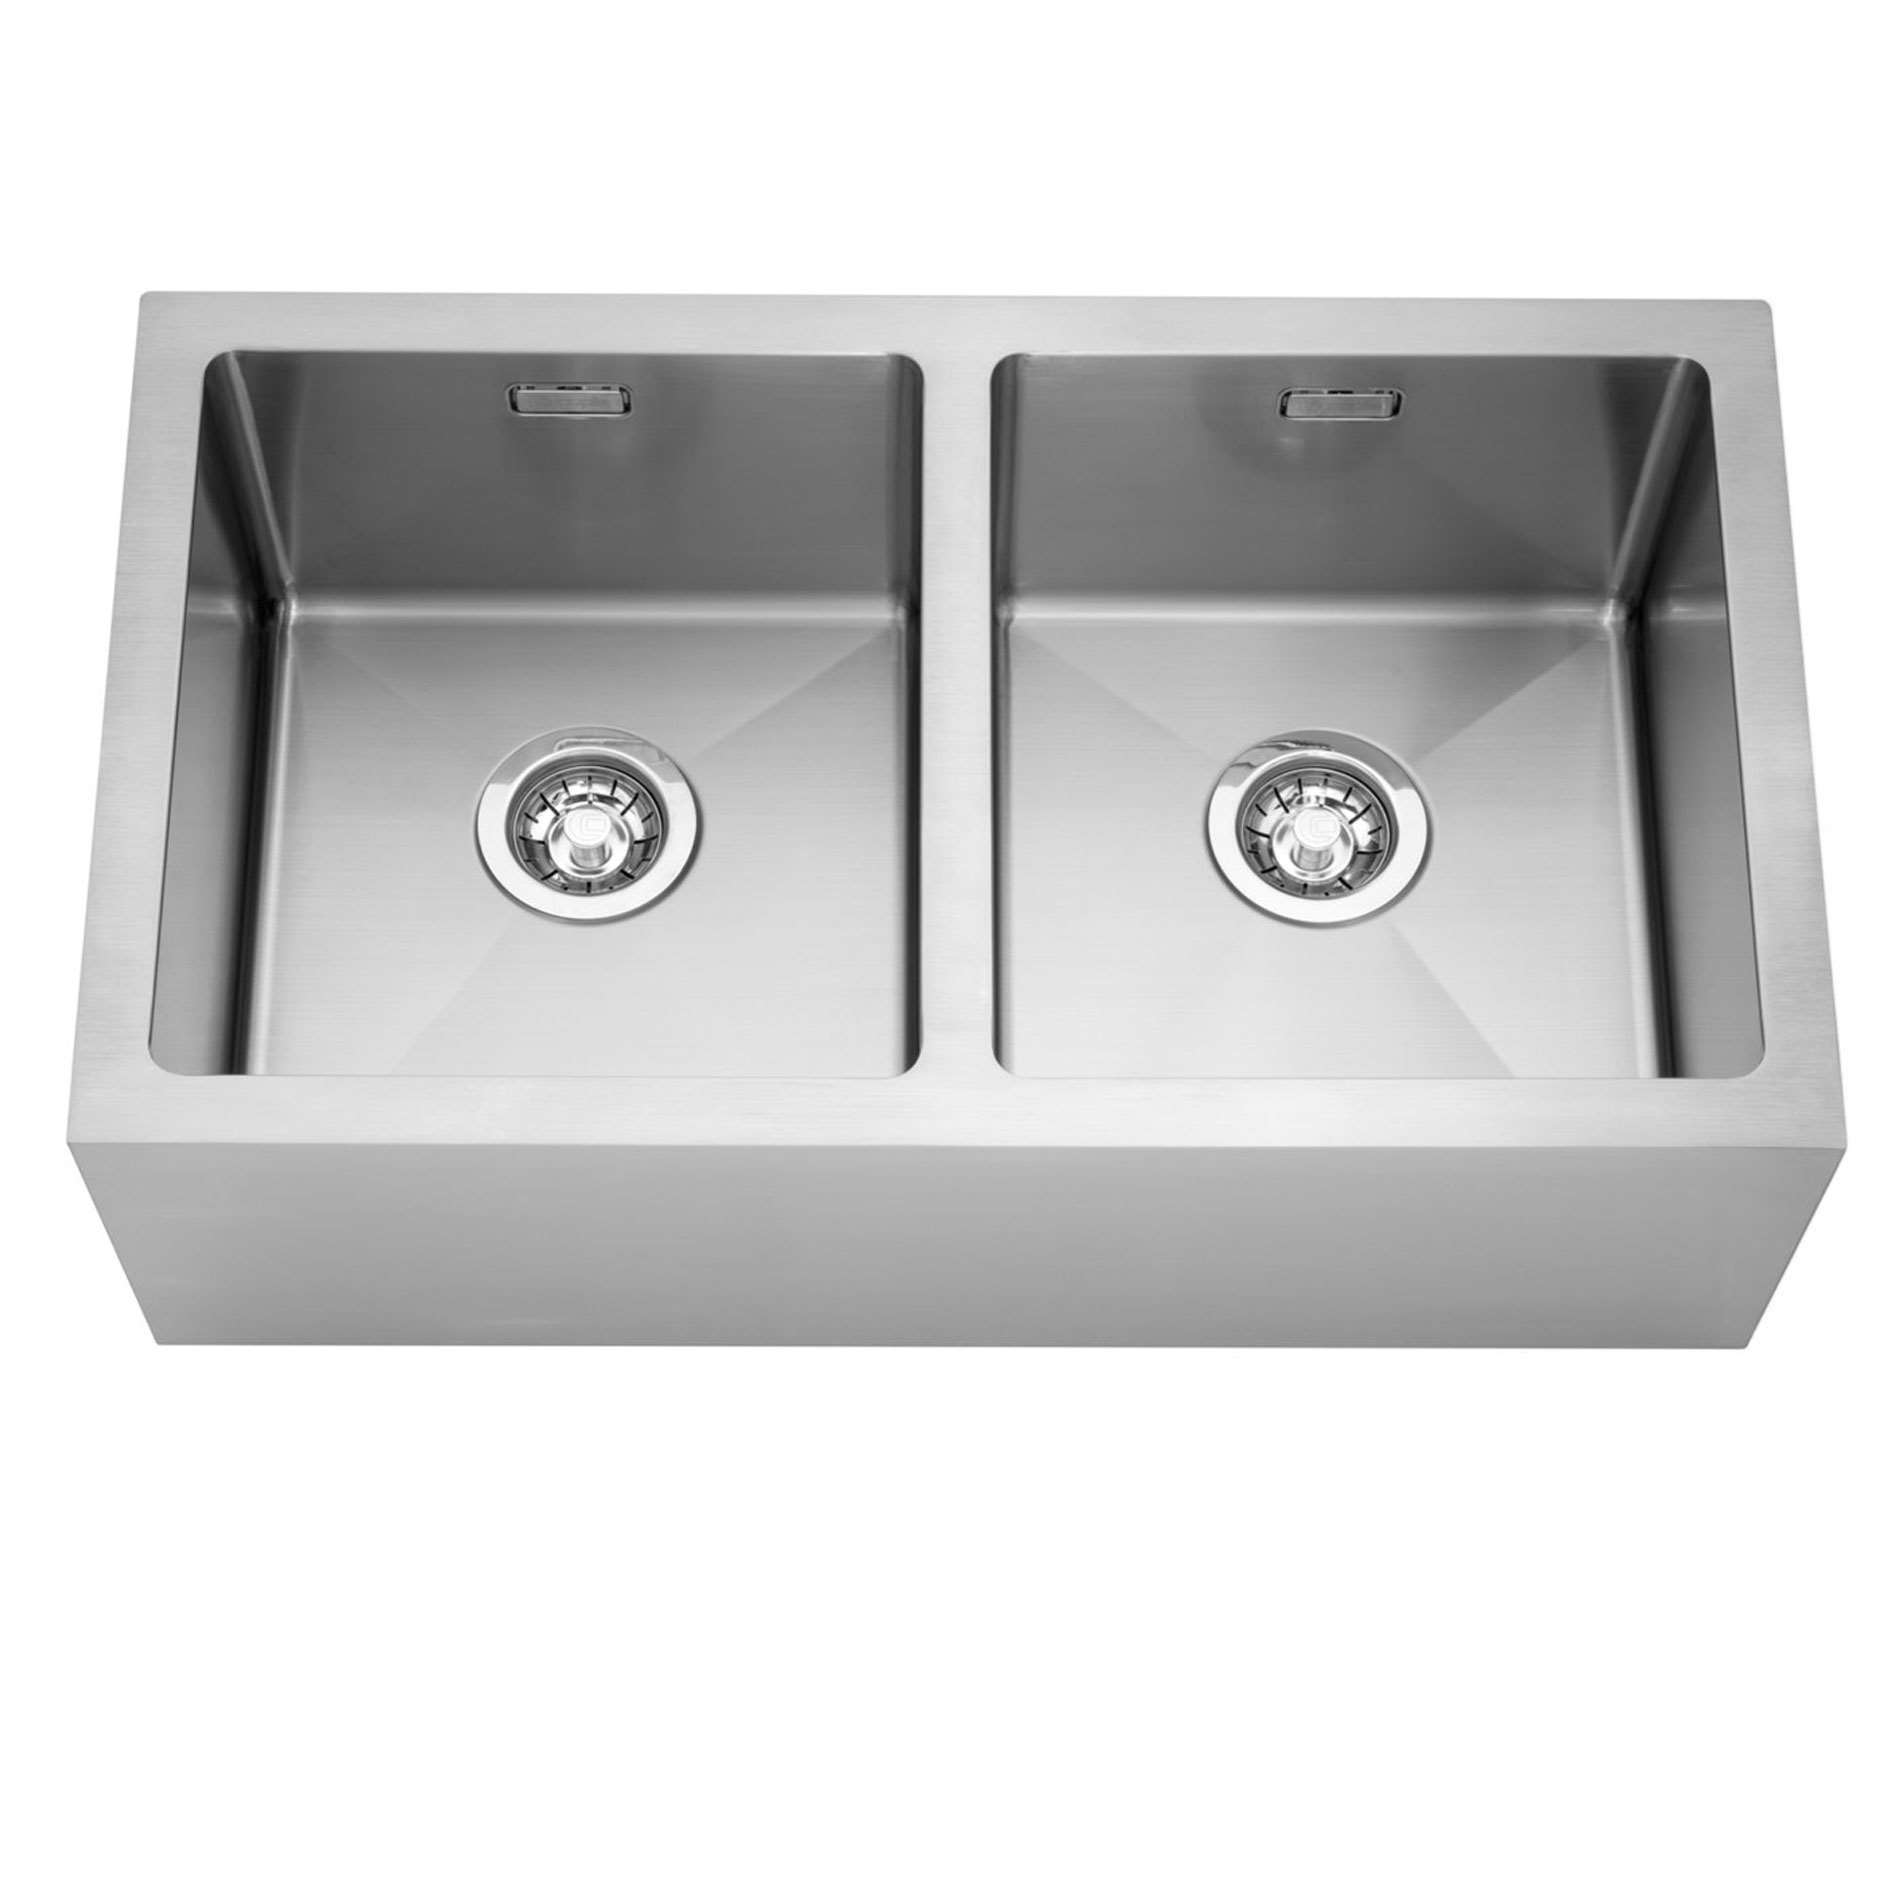 caple double belfast stainless steel sink